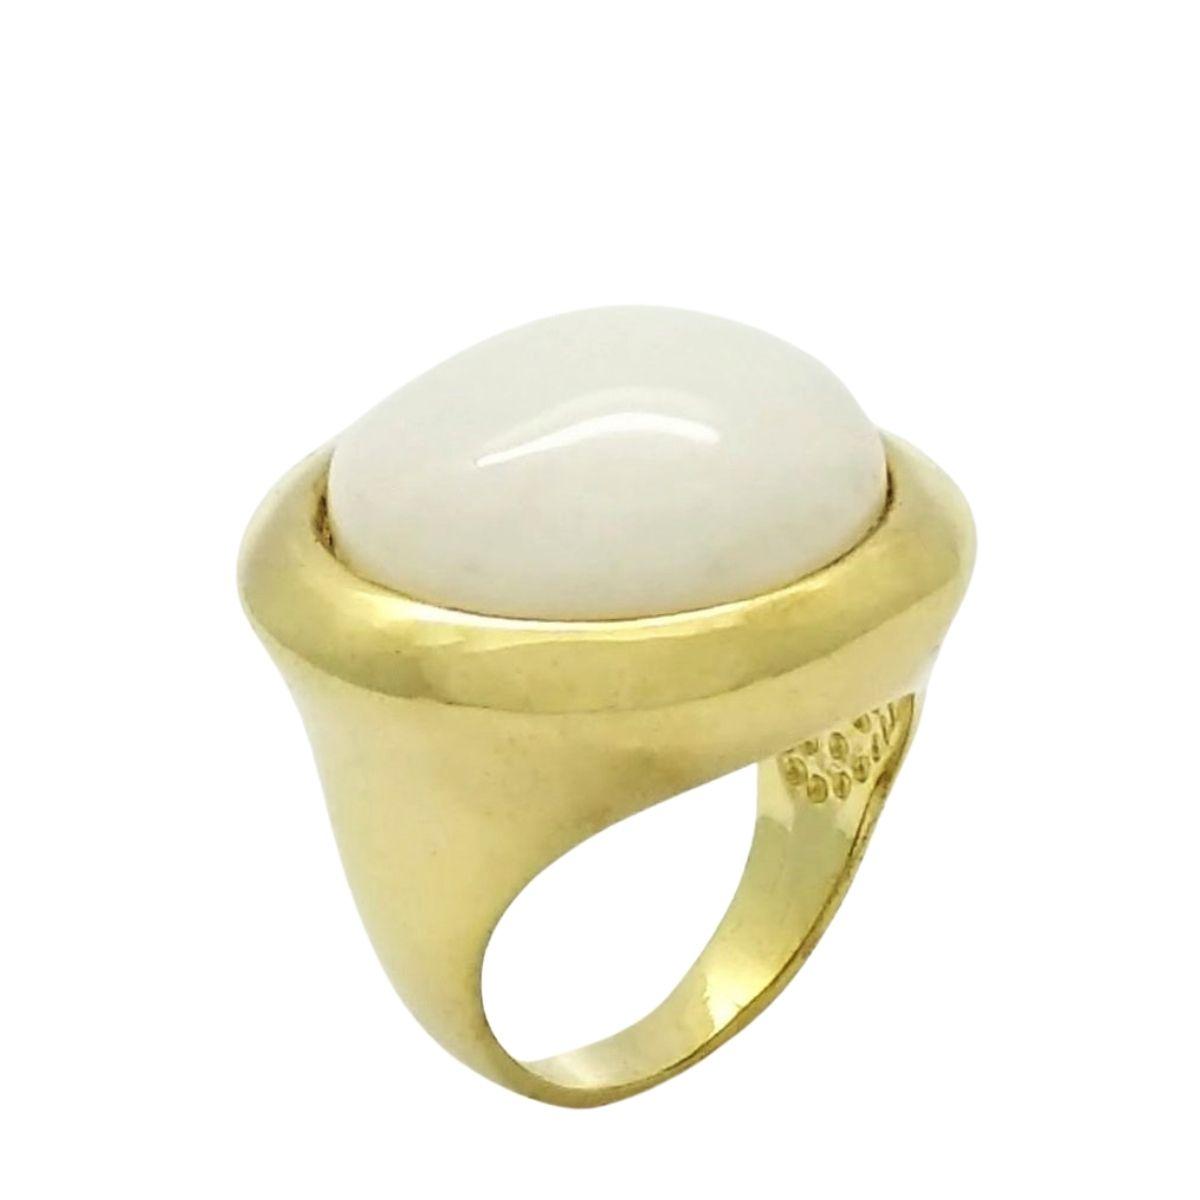 Anel De Pedra Natural Ágata Banho De Ouro 18k 2219